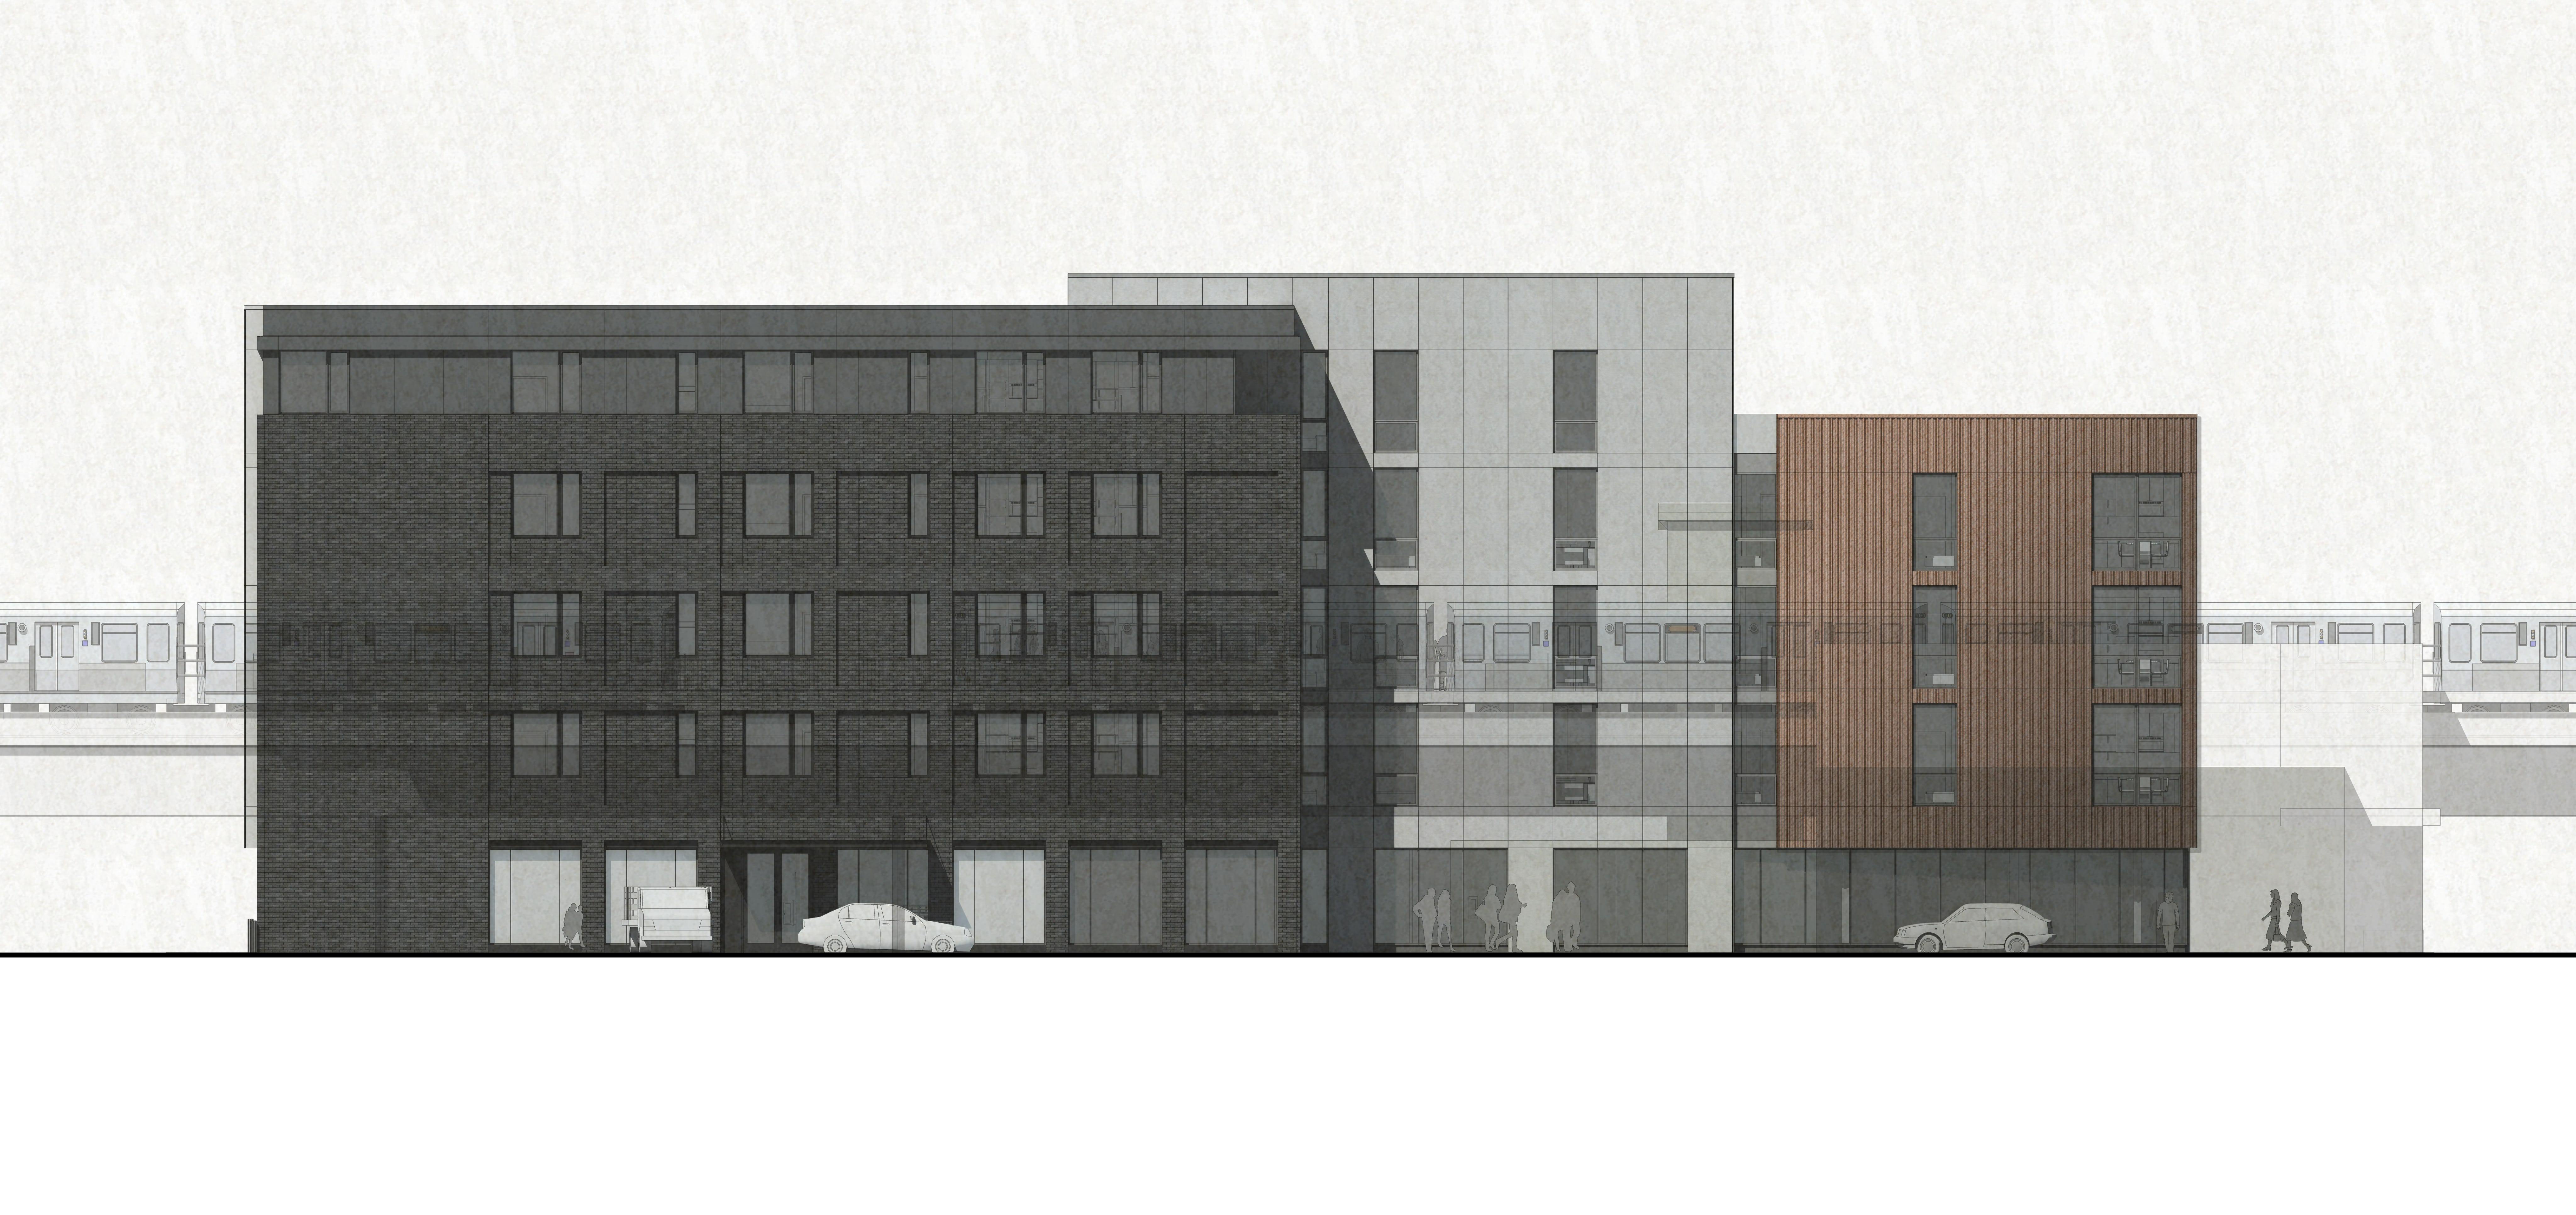 Montrose elevation level architecture incorporated